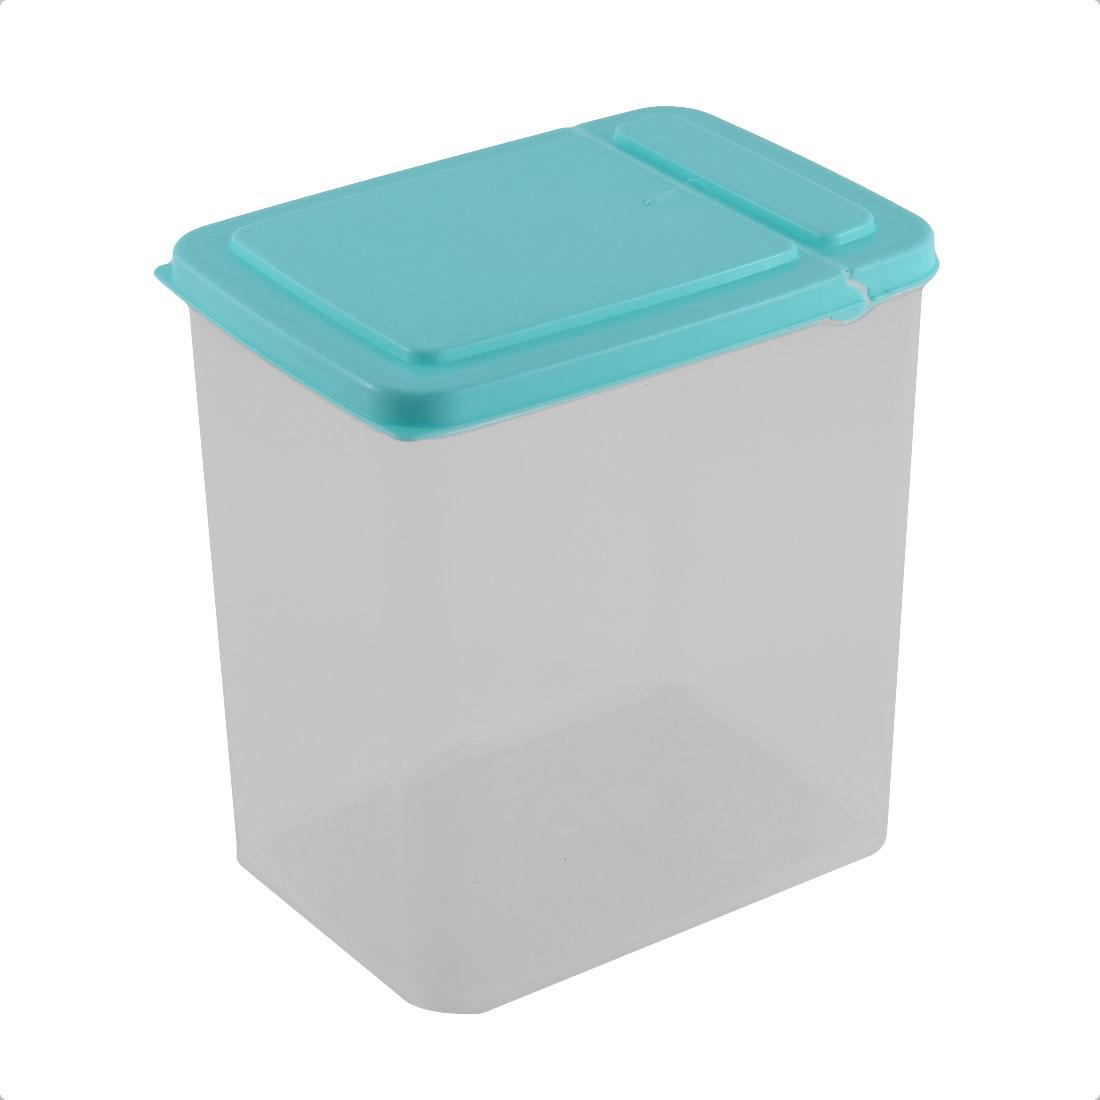 Kitchen Pantry Refrigerator Freezer Plastic Transparent Storage Box Container Blue